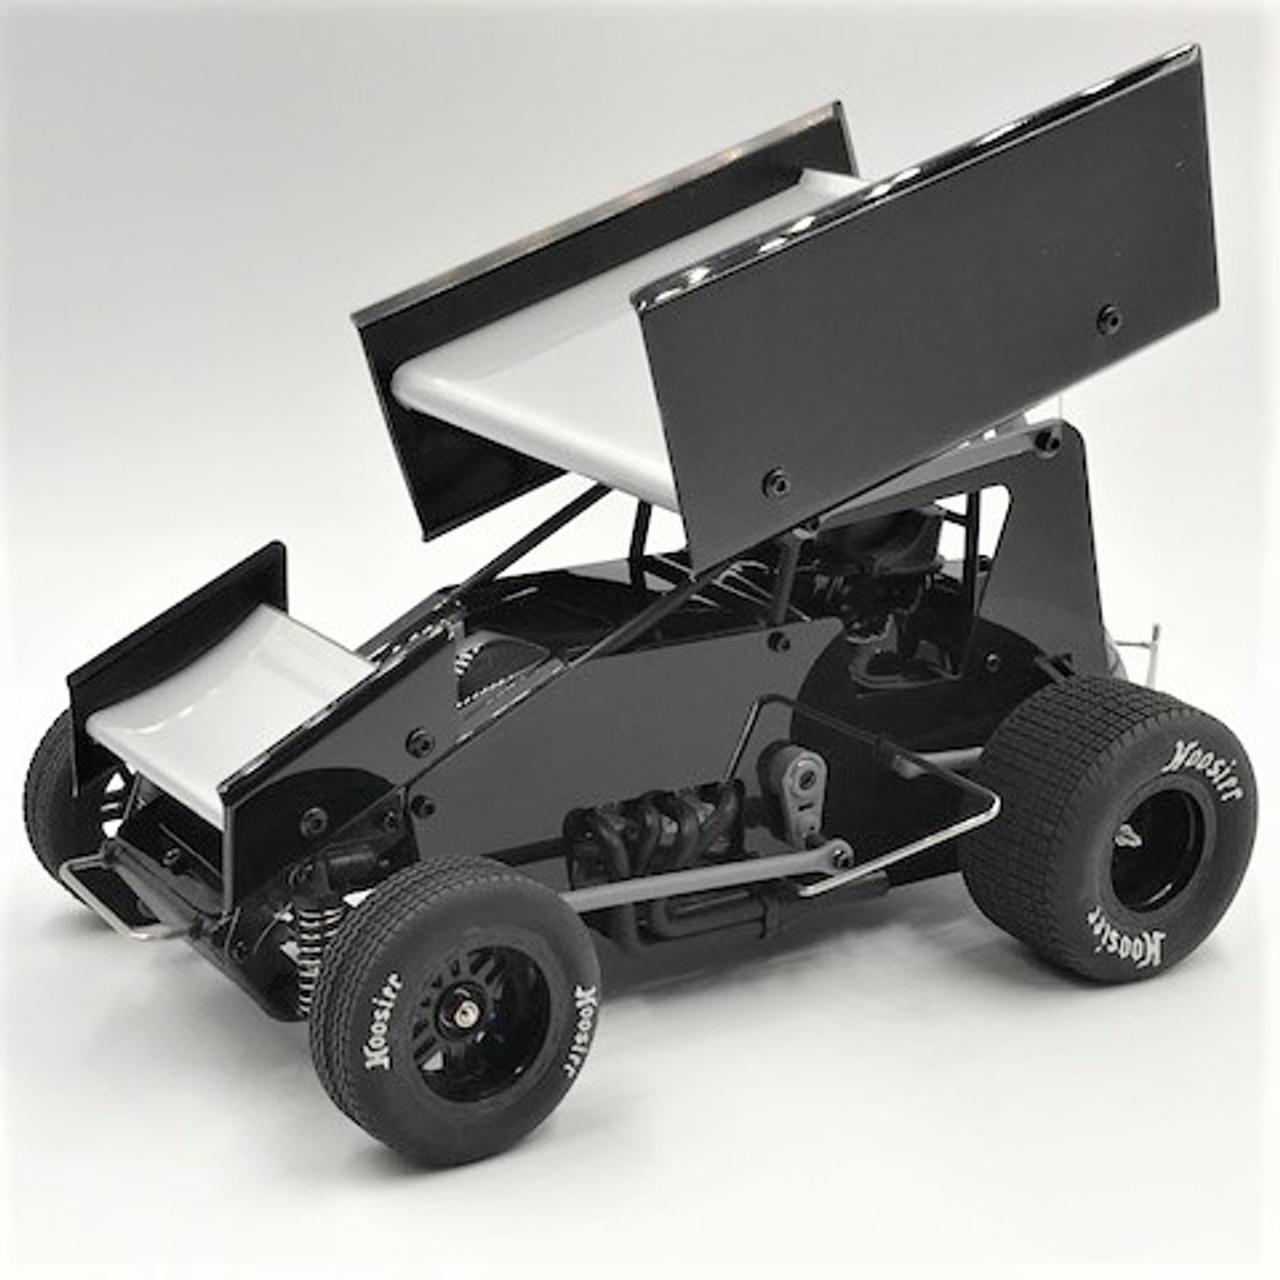 Rc Car Racing >> Highly Detailed Radio Controlled Midget Race Cars 1rc Racing